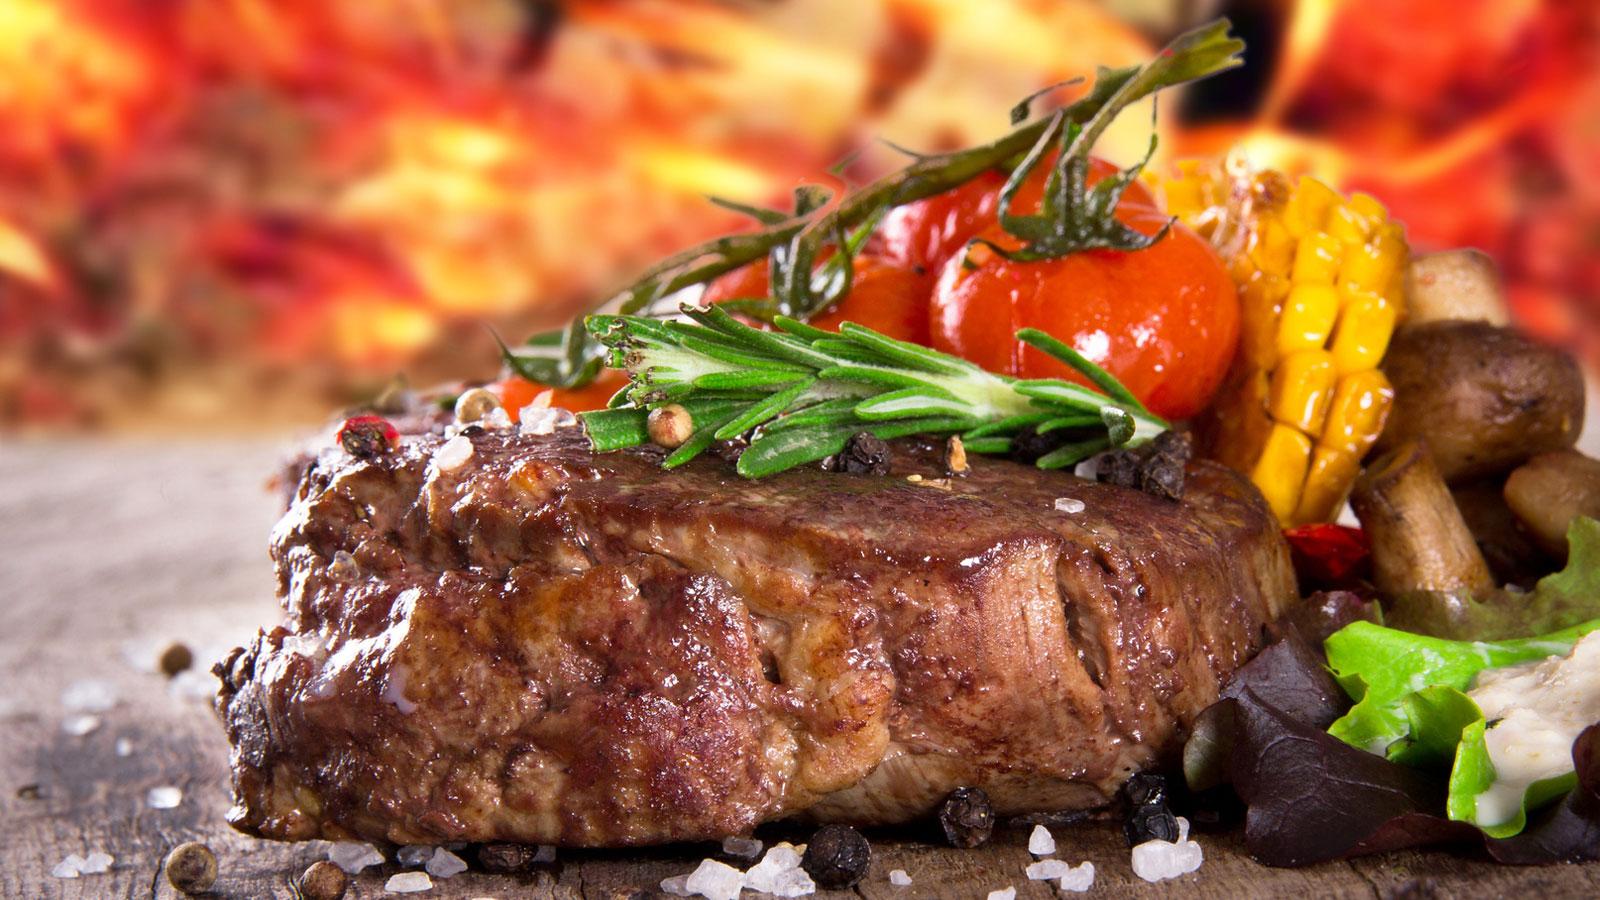 Trattoria dallOste ristorante firenze  cucina tipica toscana